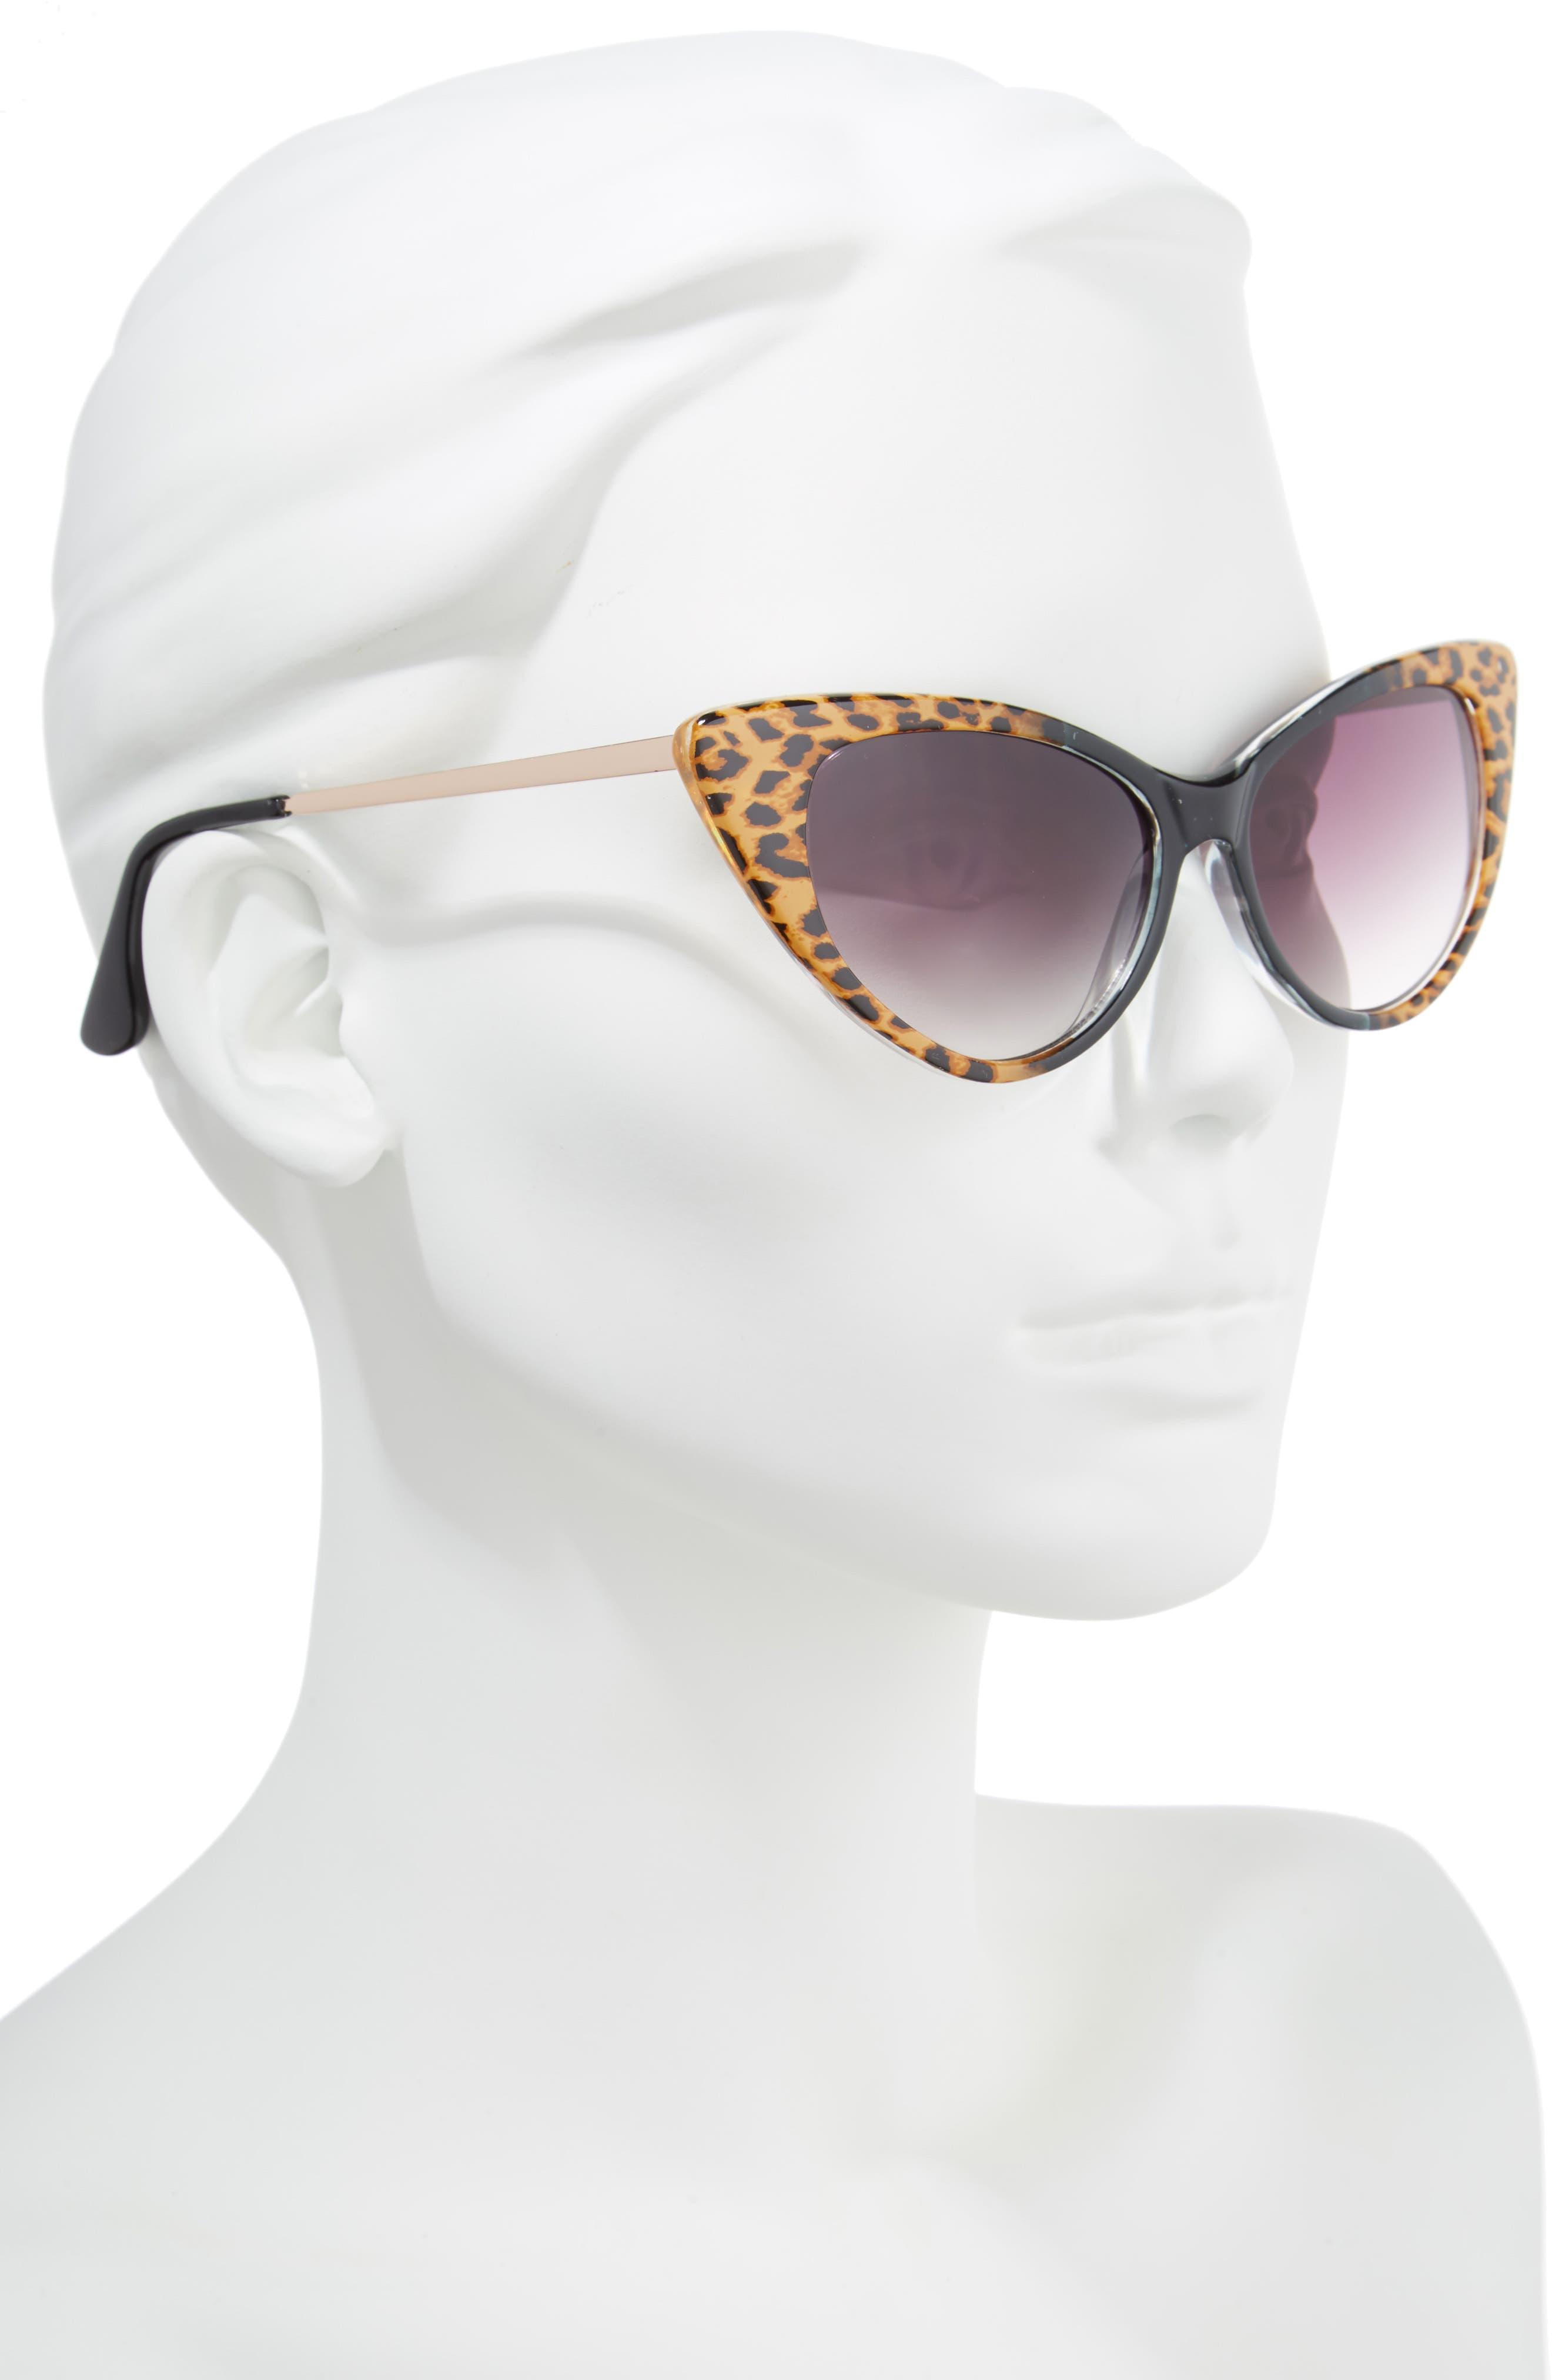 GLANCE EYEWEAR,                             62mm Leopard Print Cat Eye Sunglasses,                             Alternate thumbnail 2, color,                             001